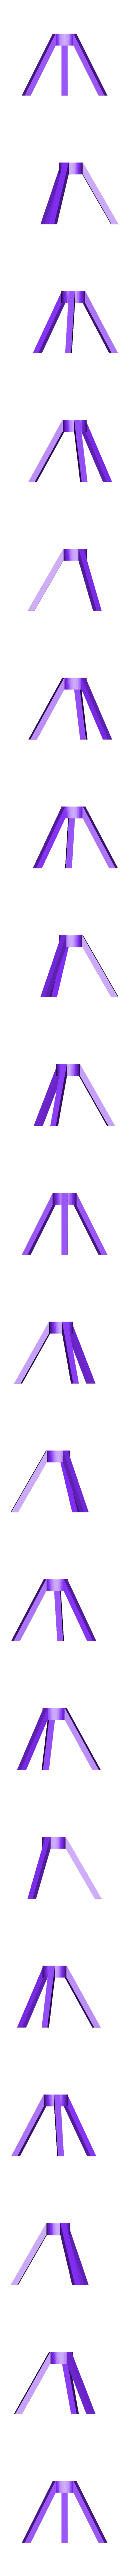 Tripode.STL Download free STL file Glass vase lamp • 3D printing design, CharlieChappie